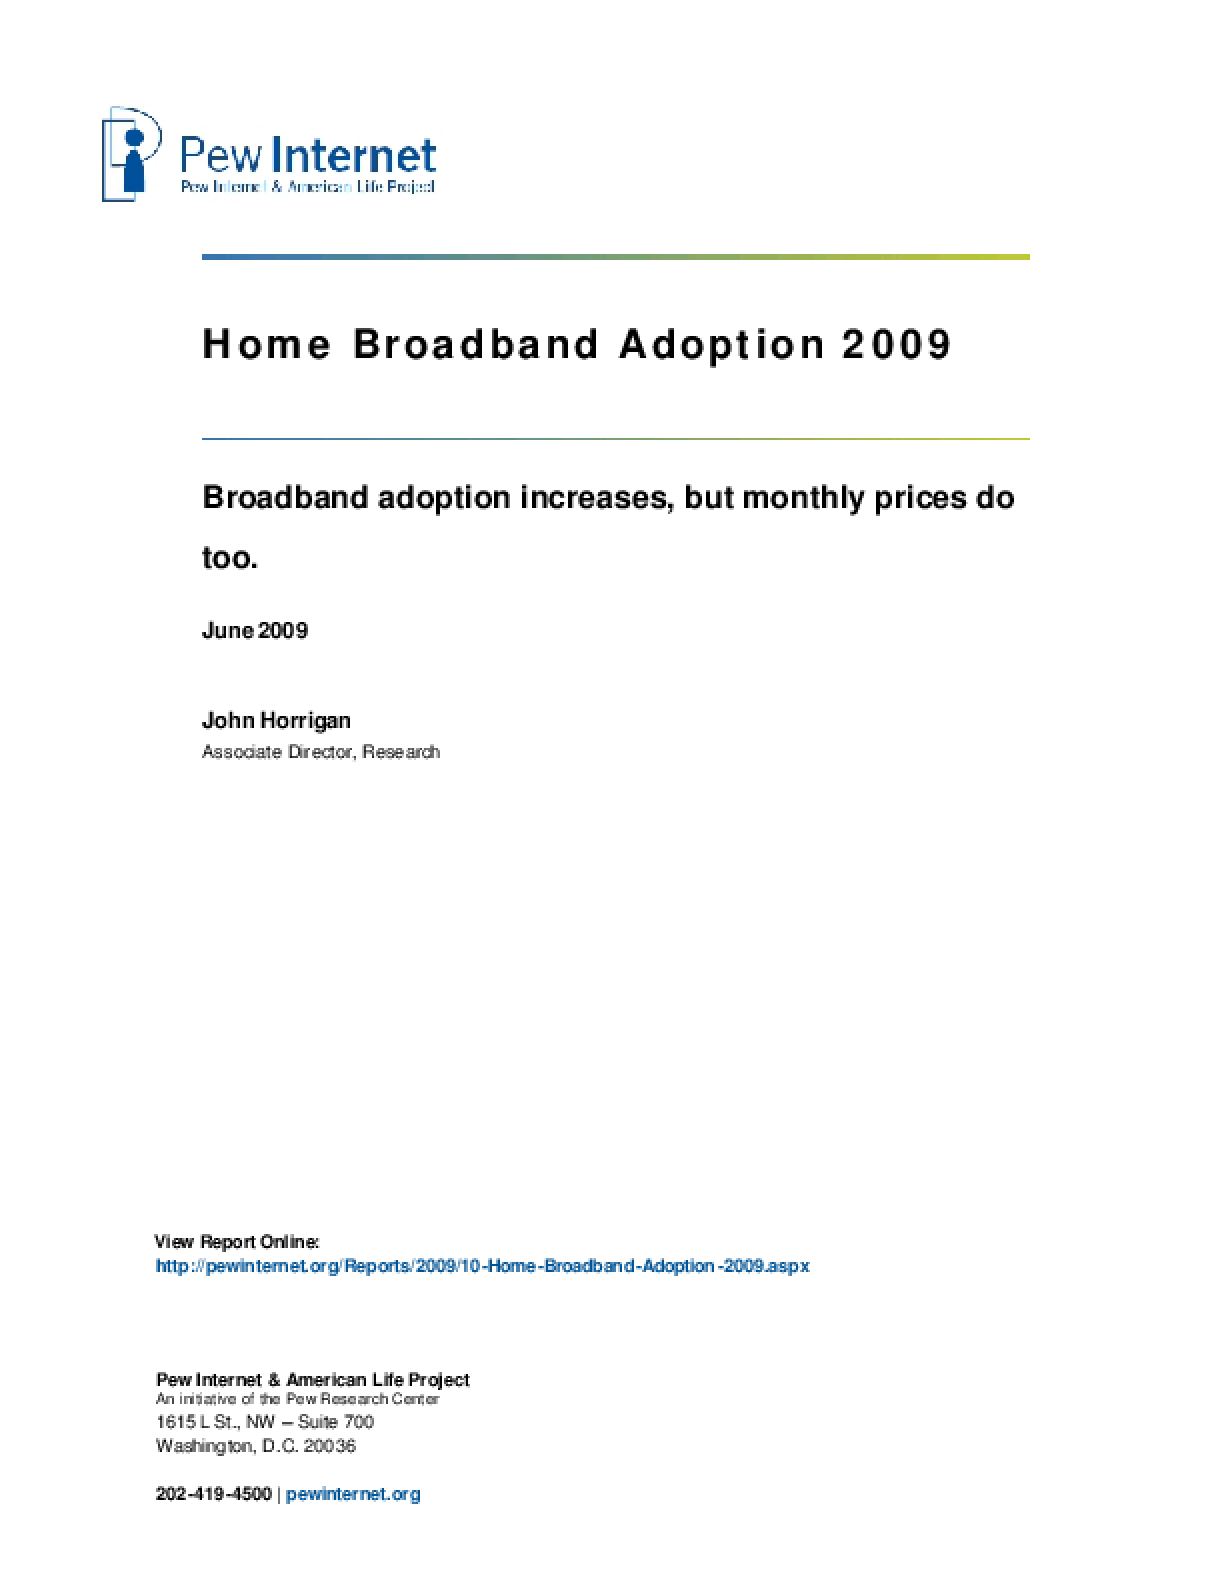 Home Broadband Adoption 2009